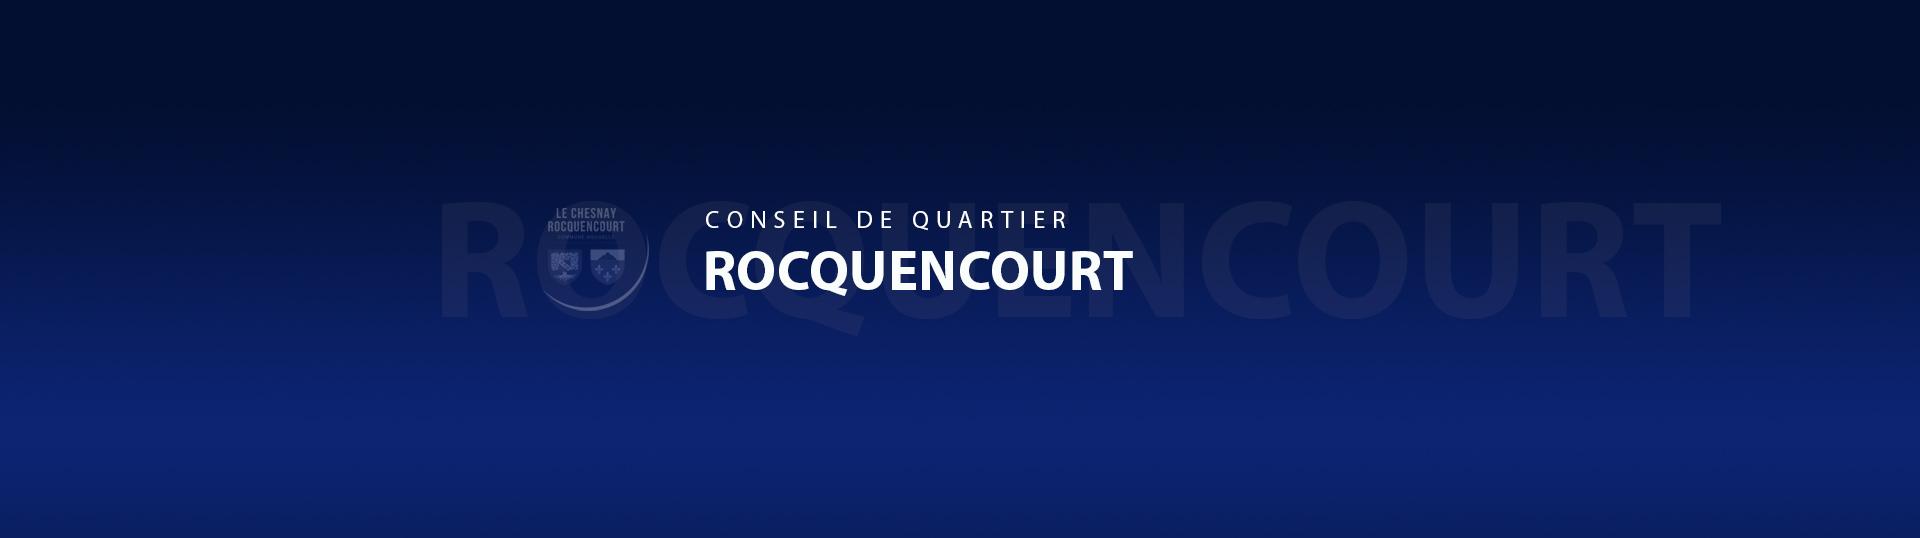 CDQ Rocquencourt